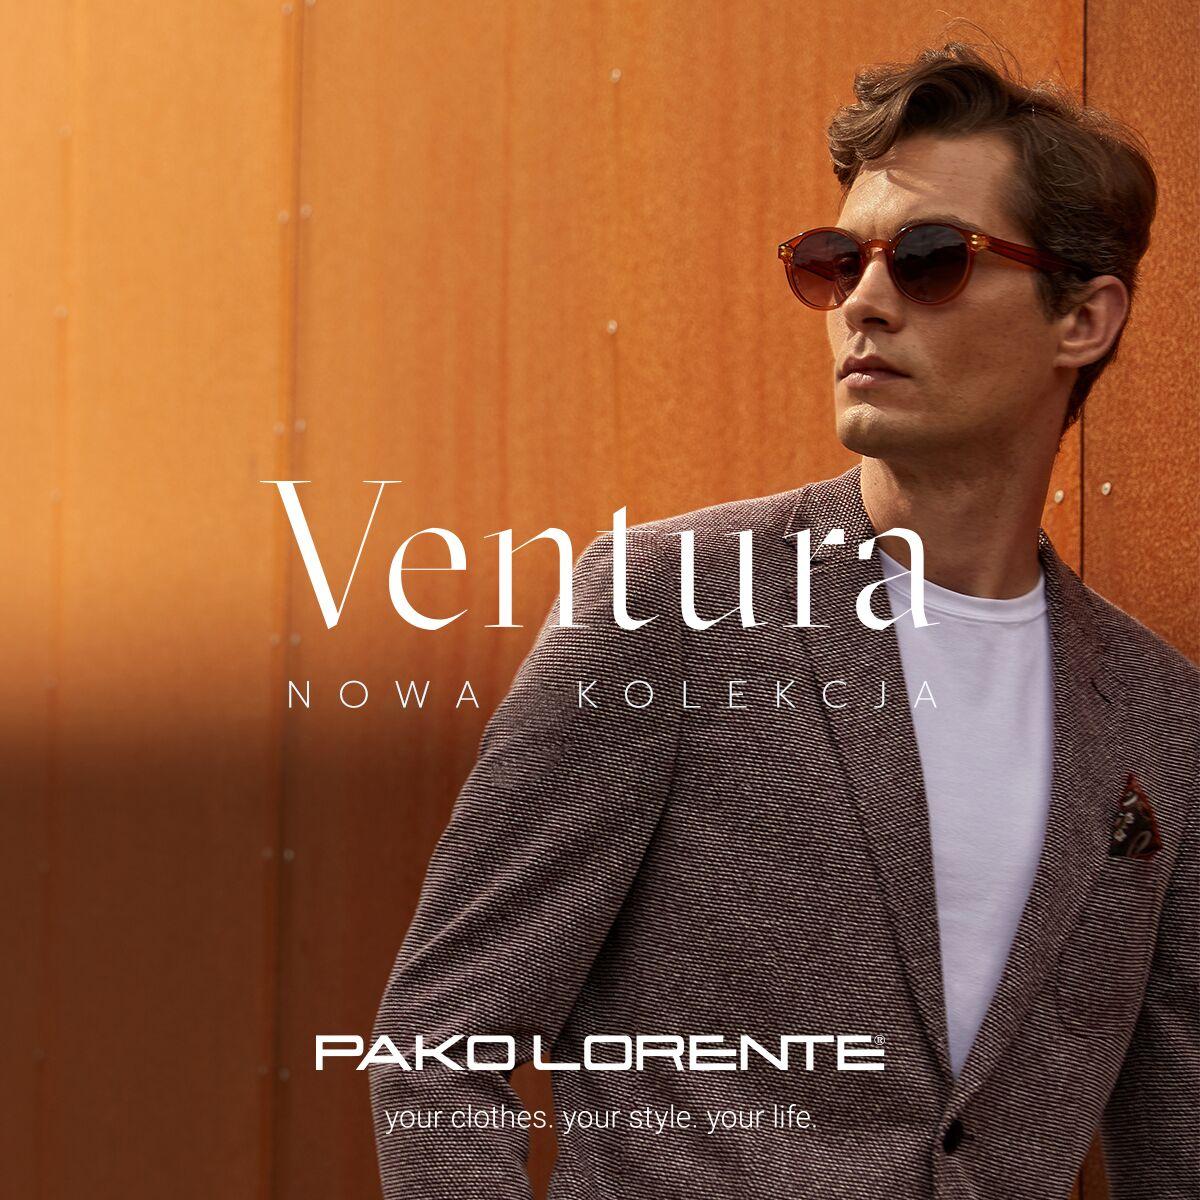 Ventura- nowa kolekcja odPako Lorente